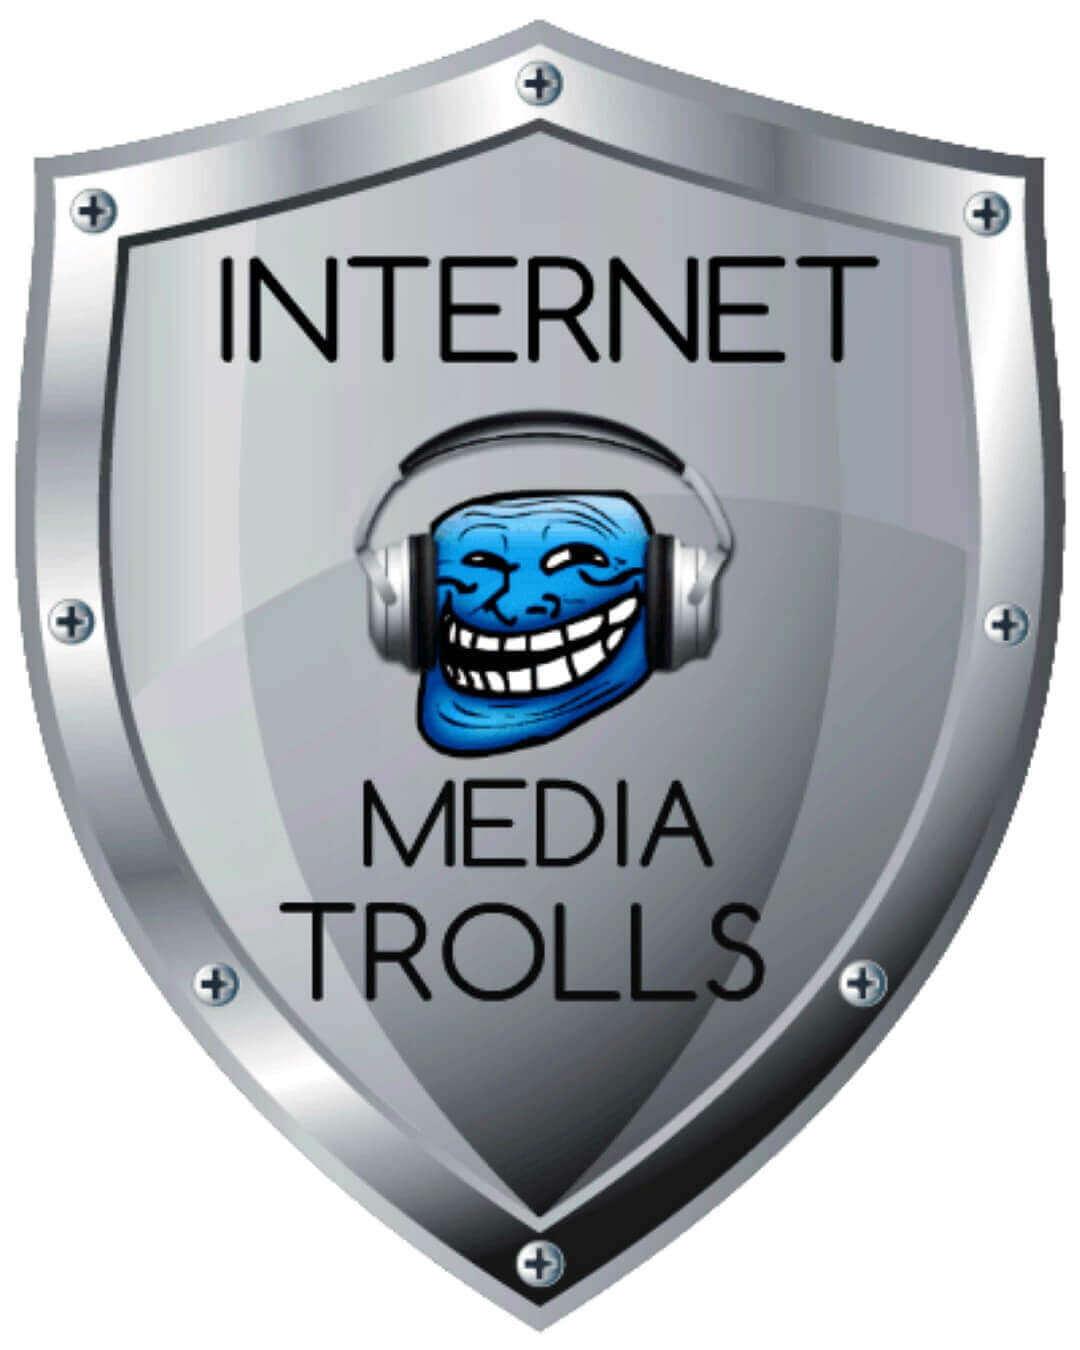 michael-nuccitelli-internet-troll-image-11